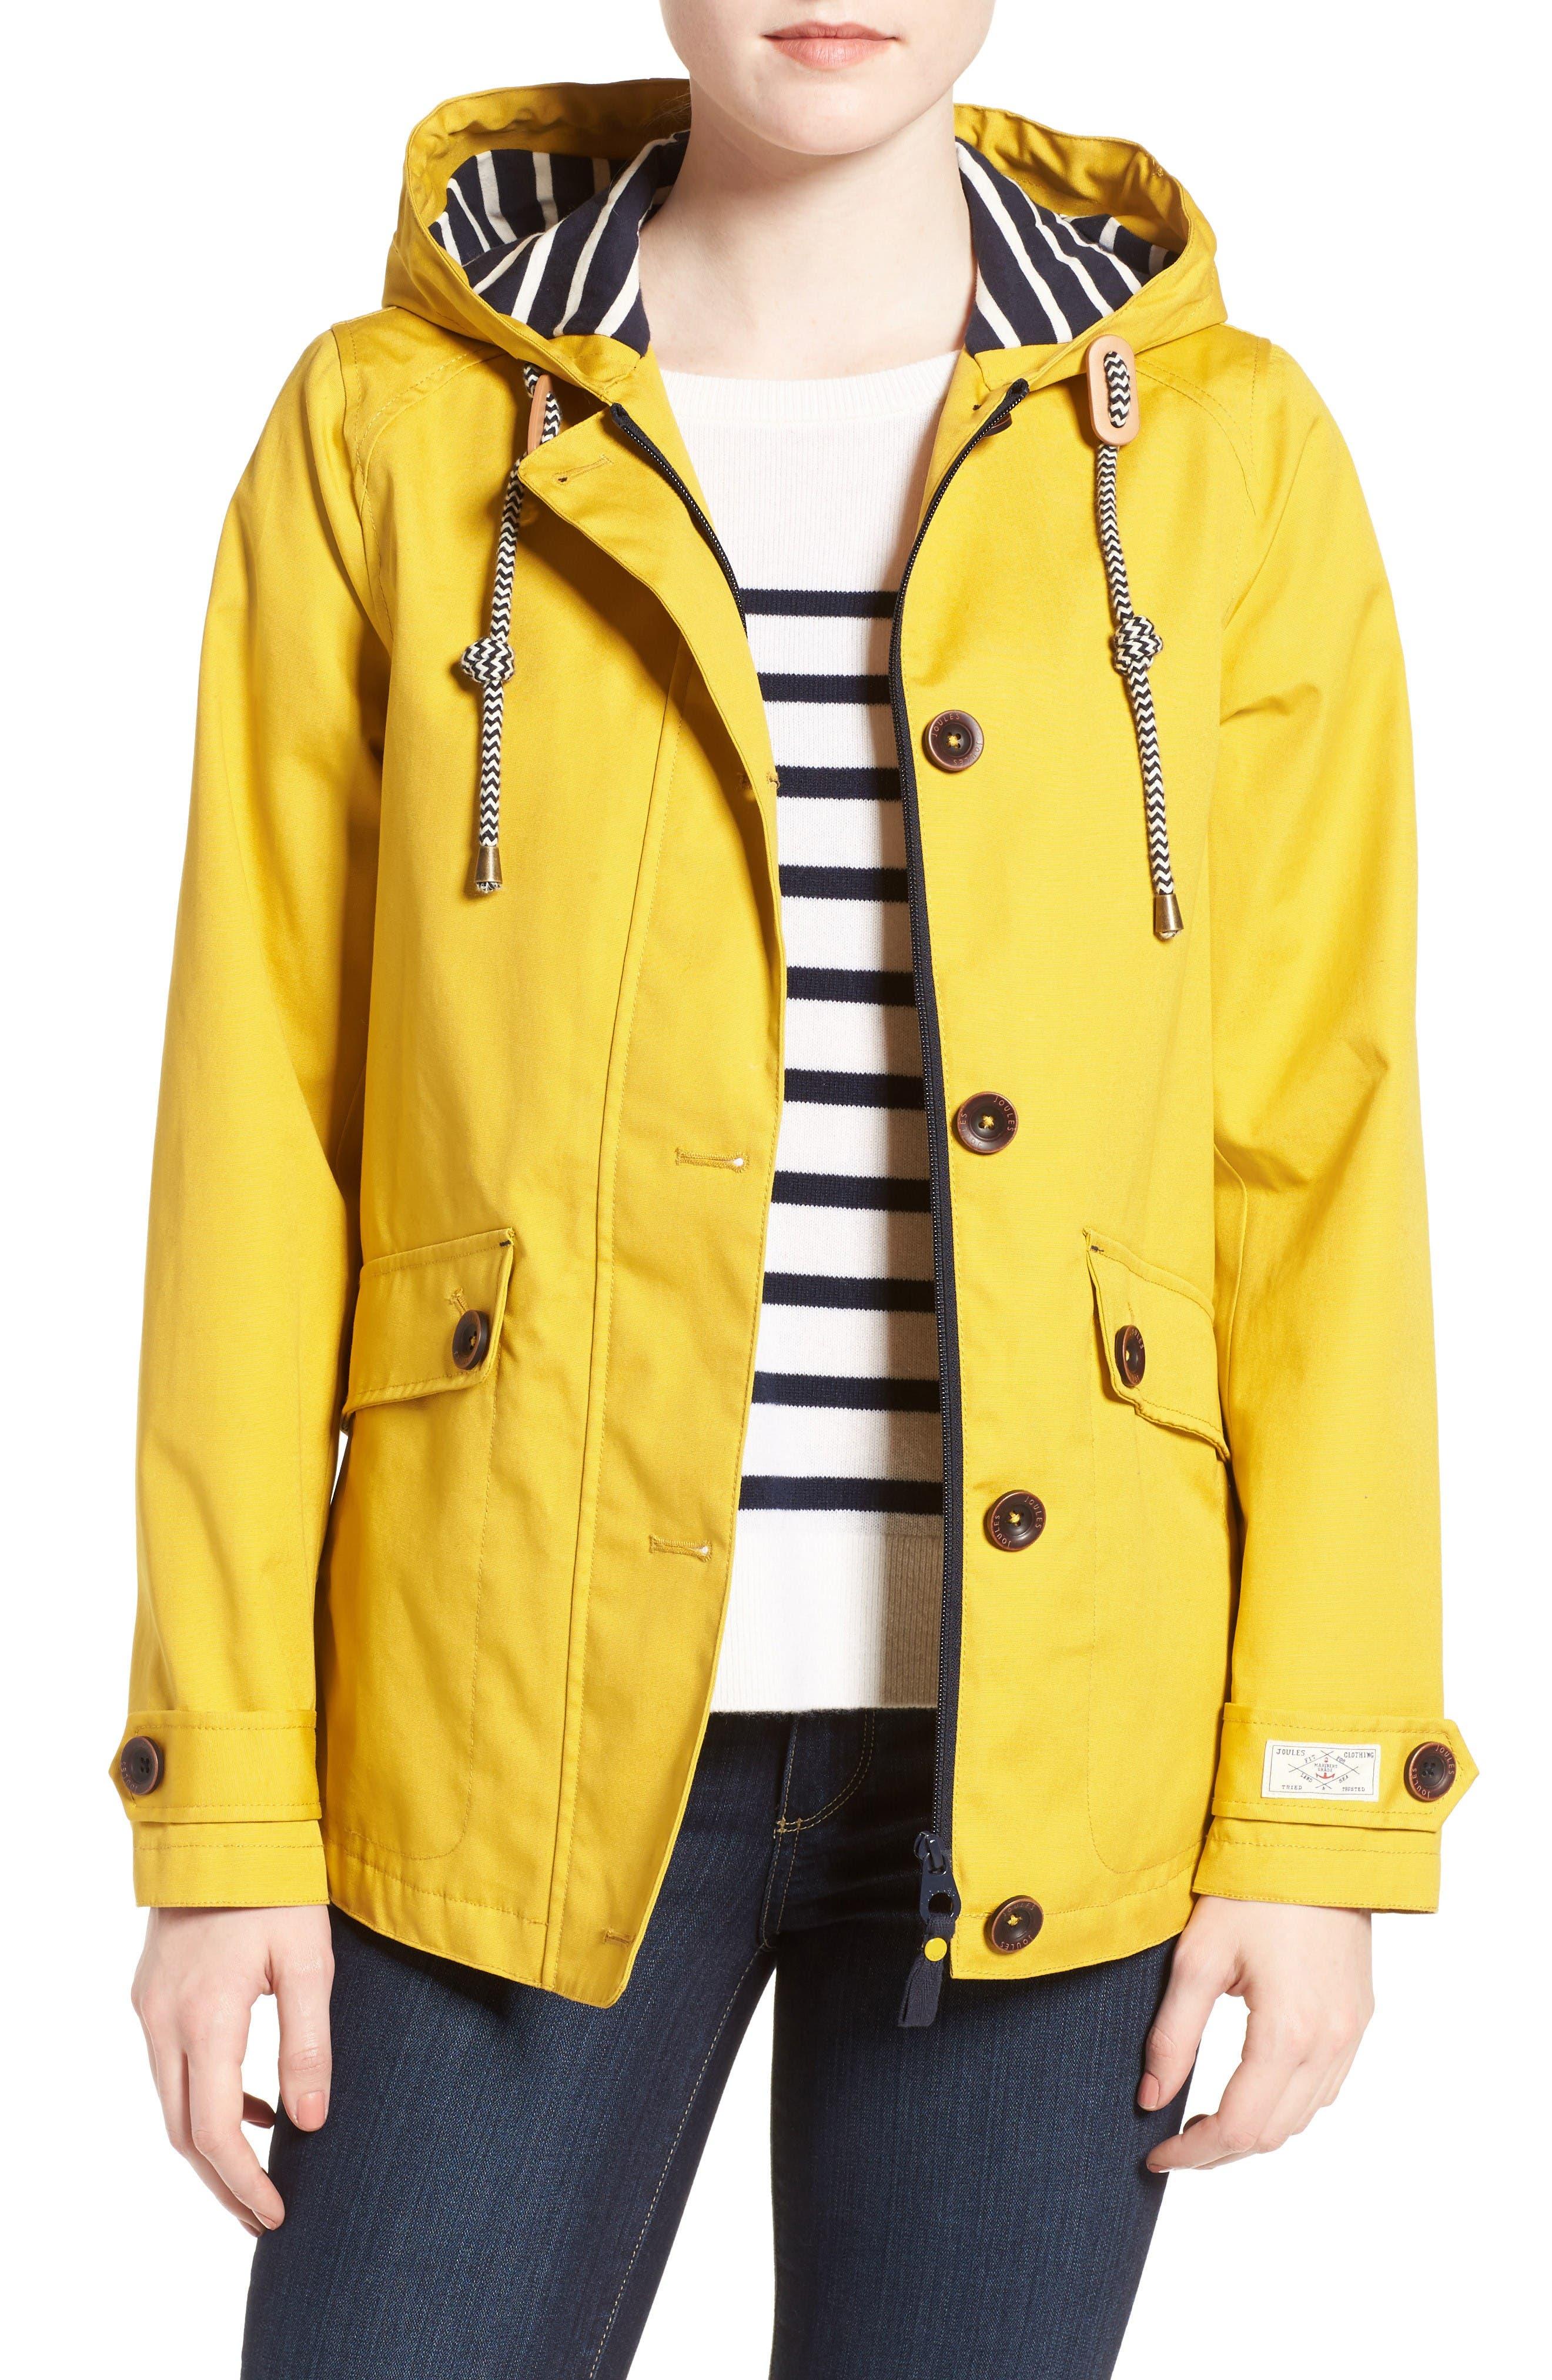 Main Image - Joules Right as Rain Waterproof Hooded Jacket